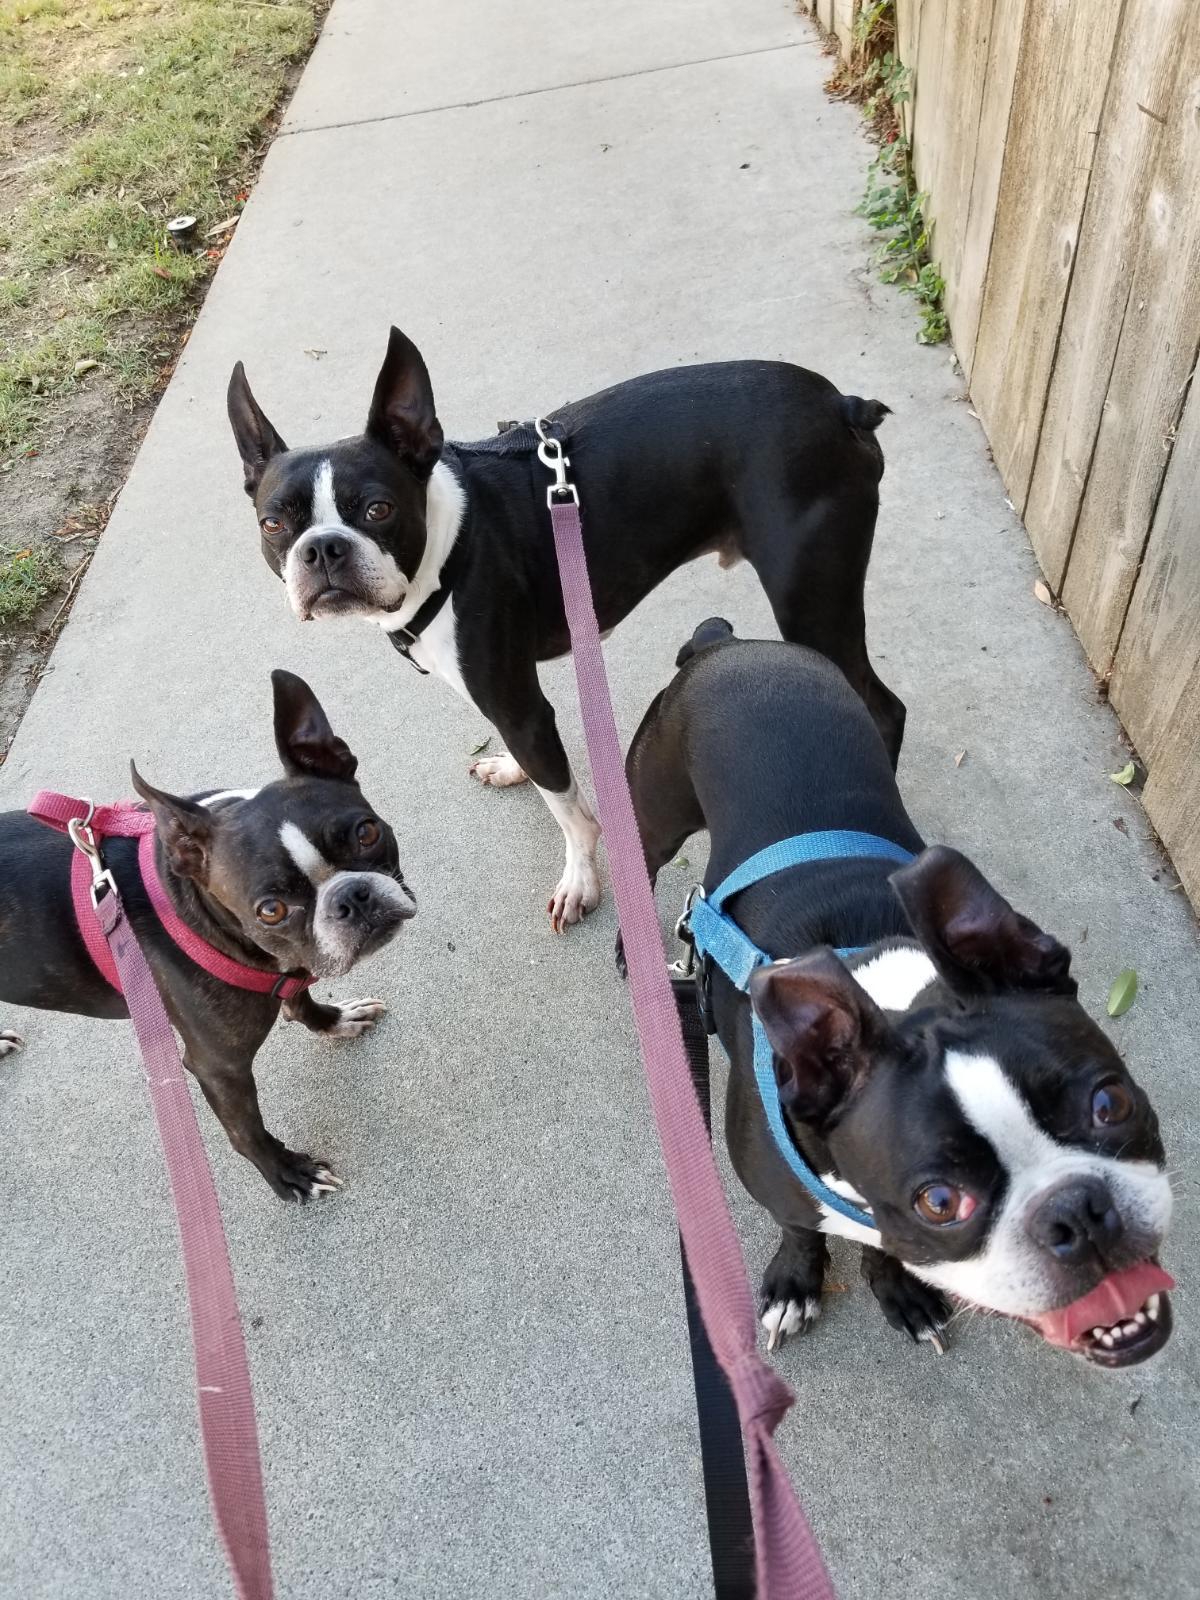 Boston Terrier brigade